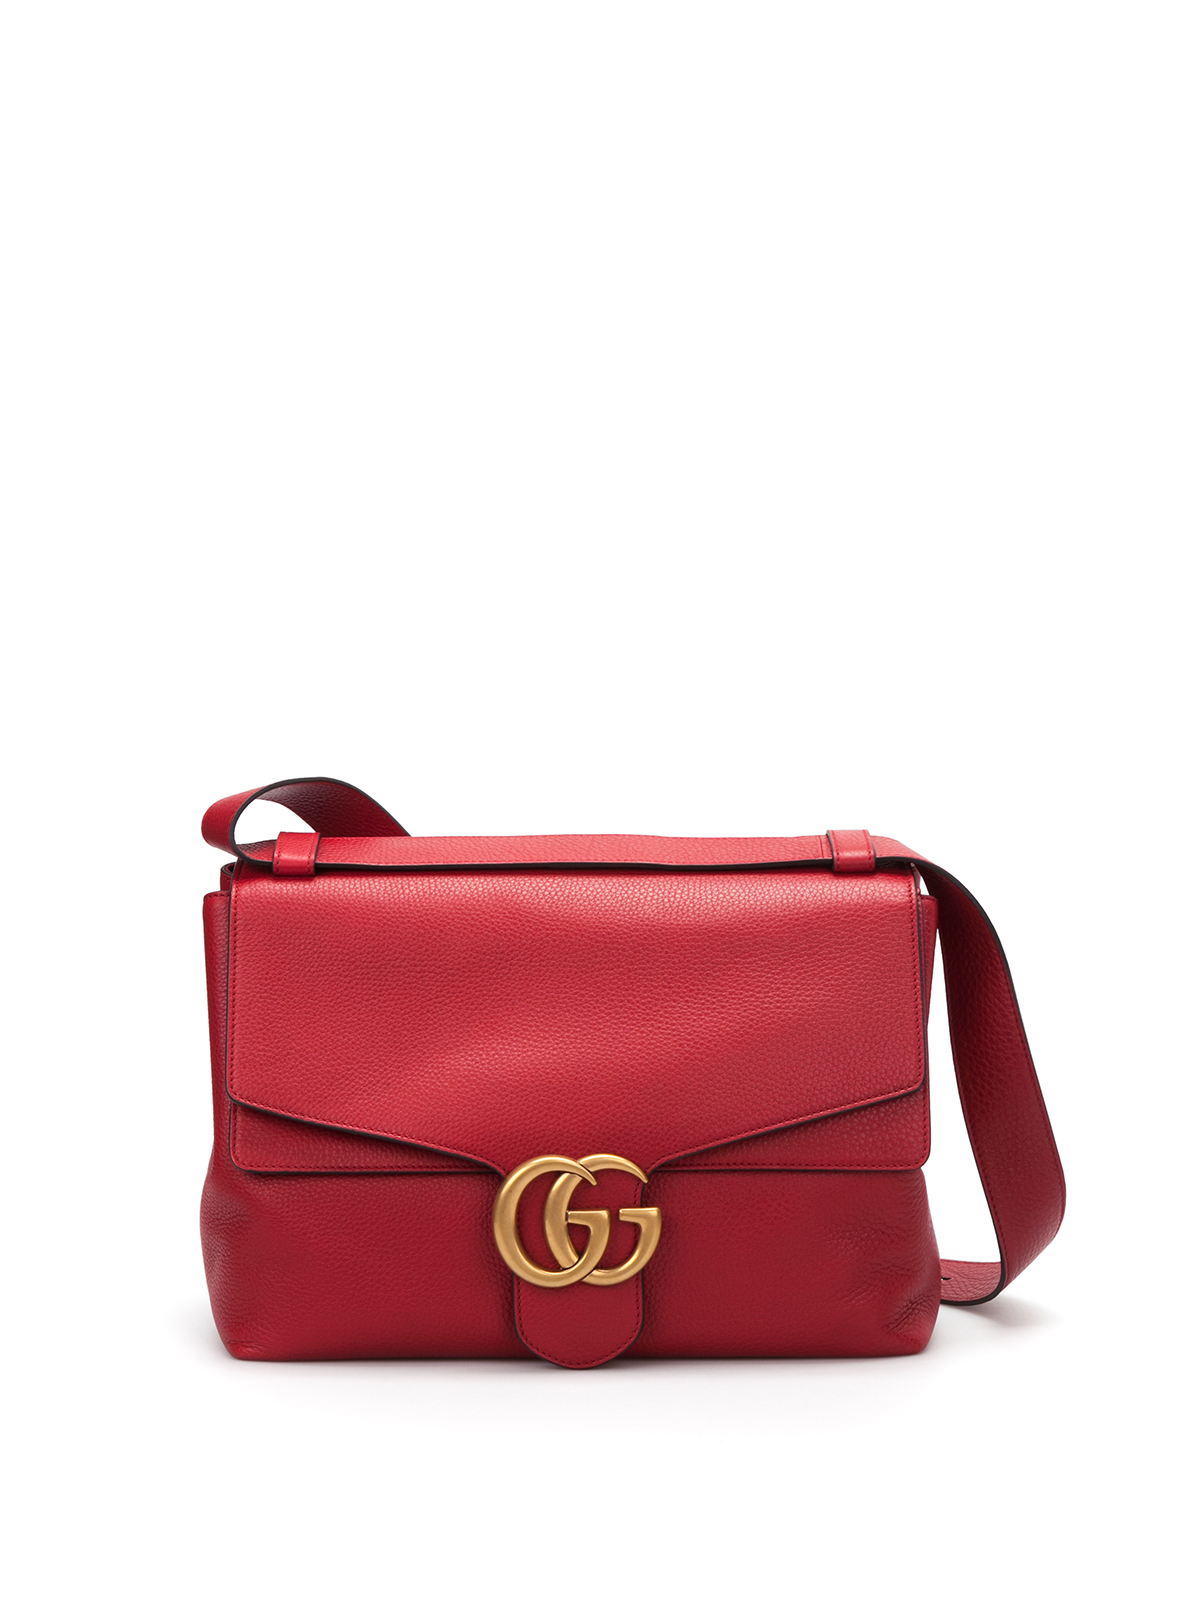 e33fbe61ba46 Gucci - GG marmont leather shoulder bag - shoulder bags - 400245 ...